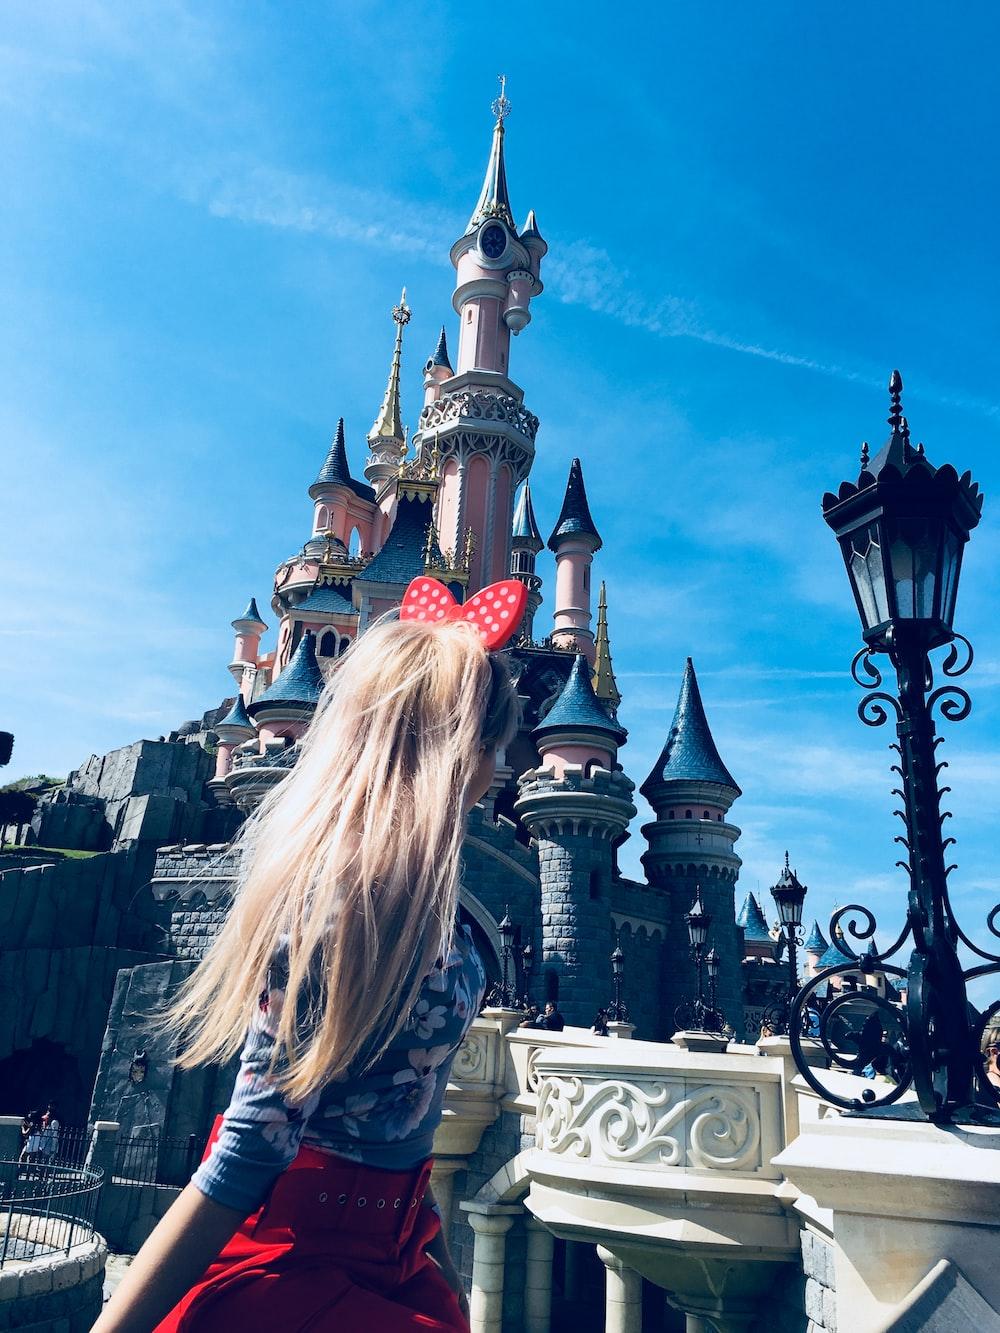 Disneyland Paris Pictures | Download Free Images on Unsplash